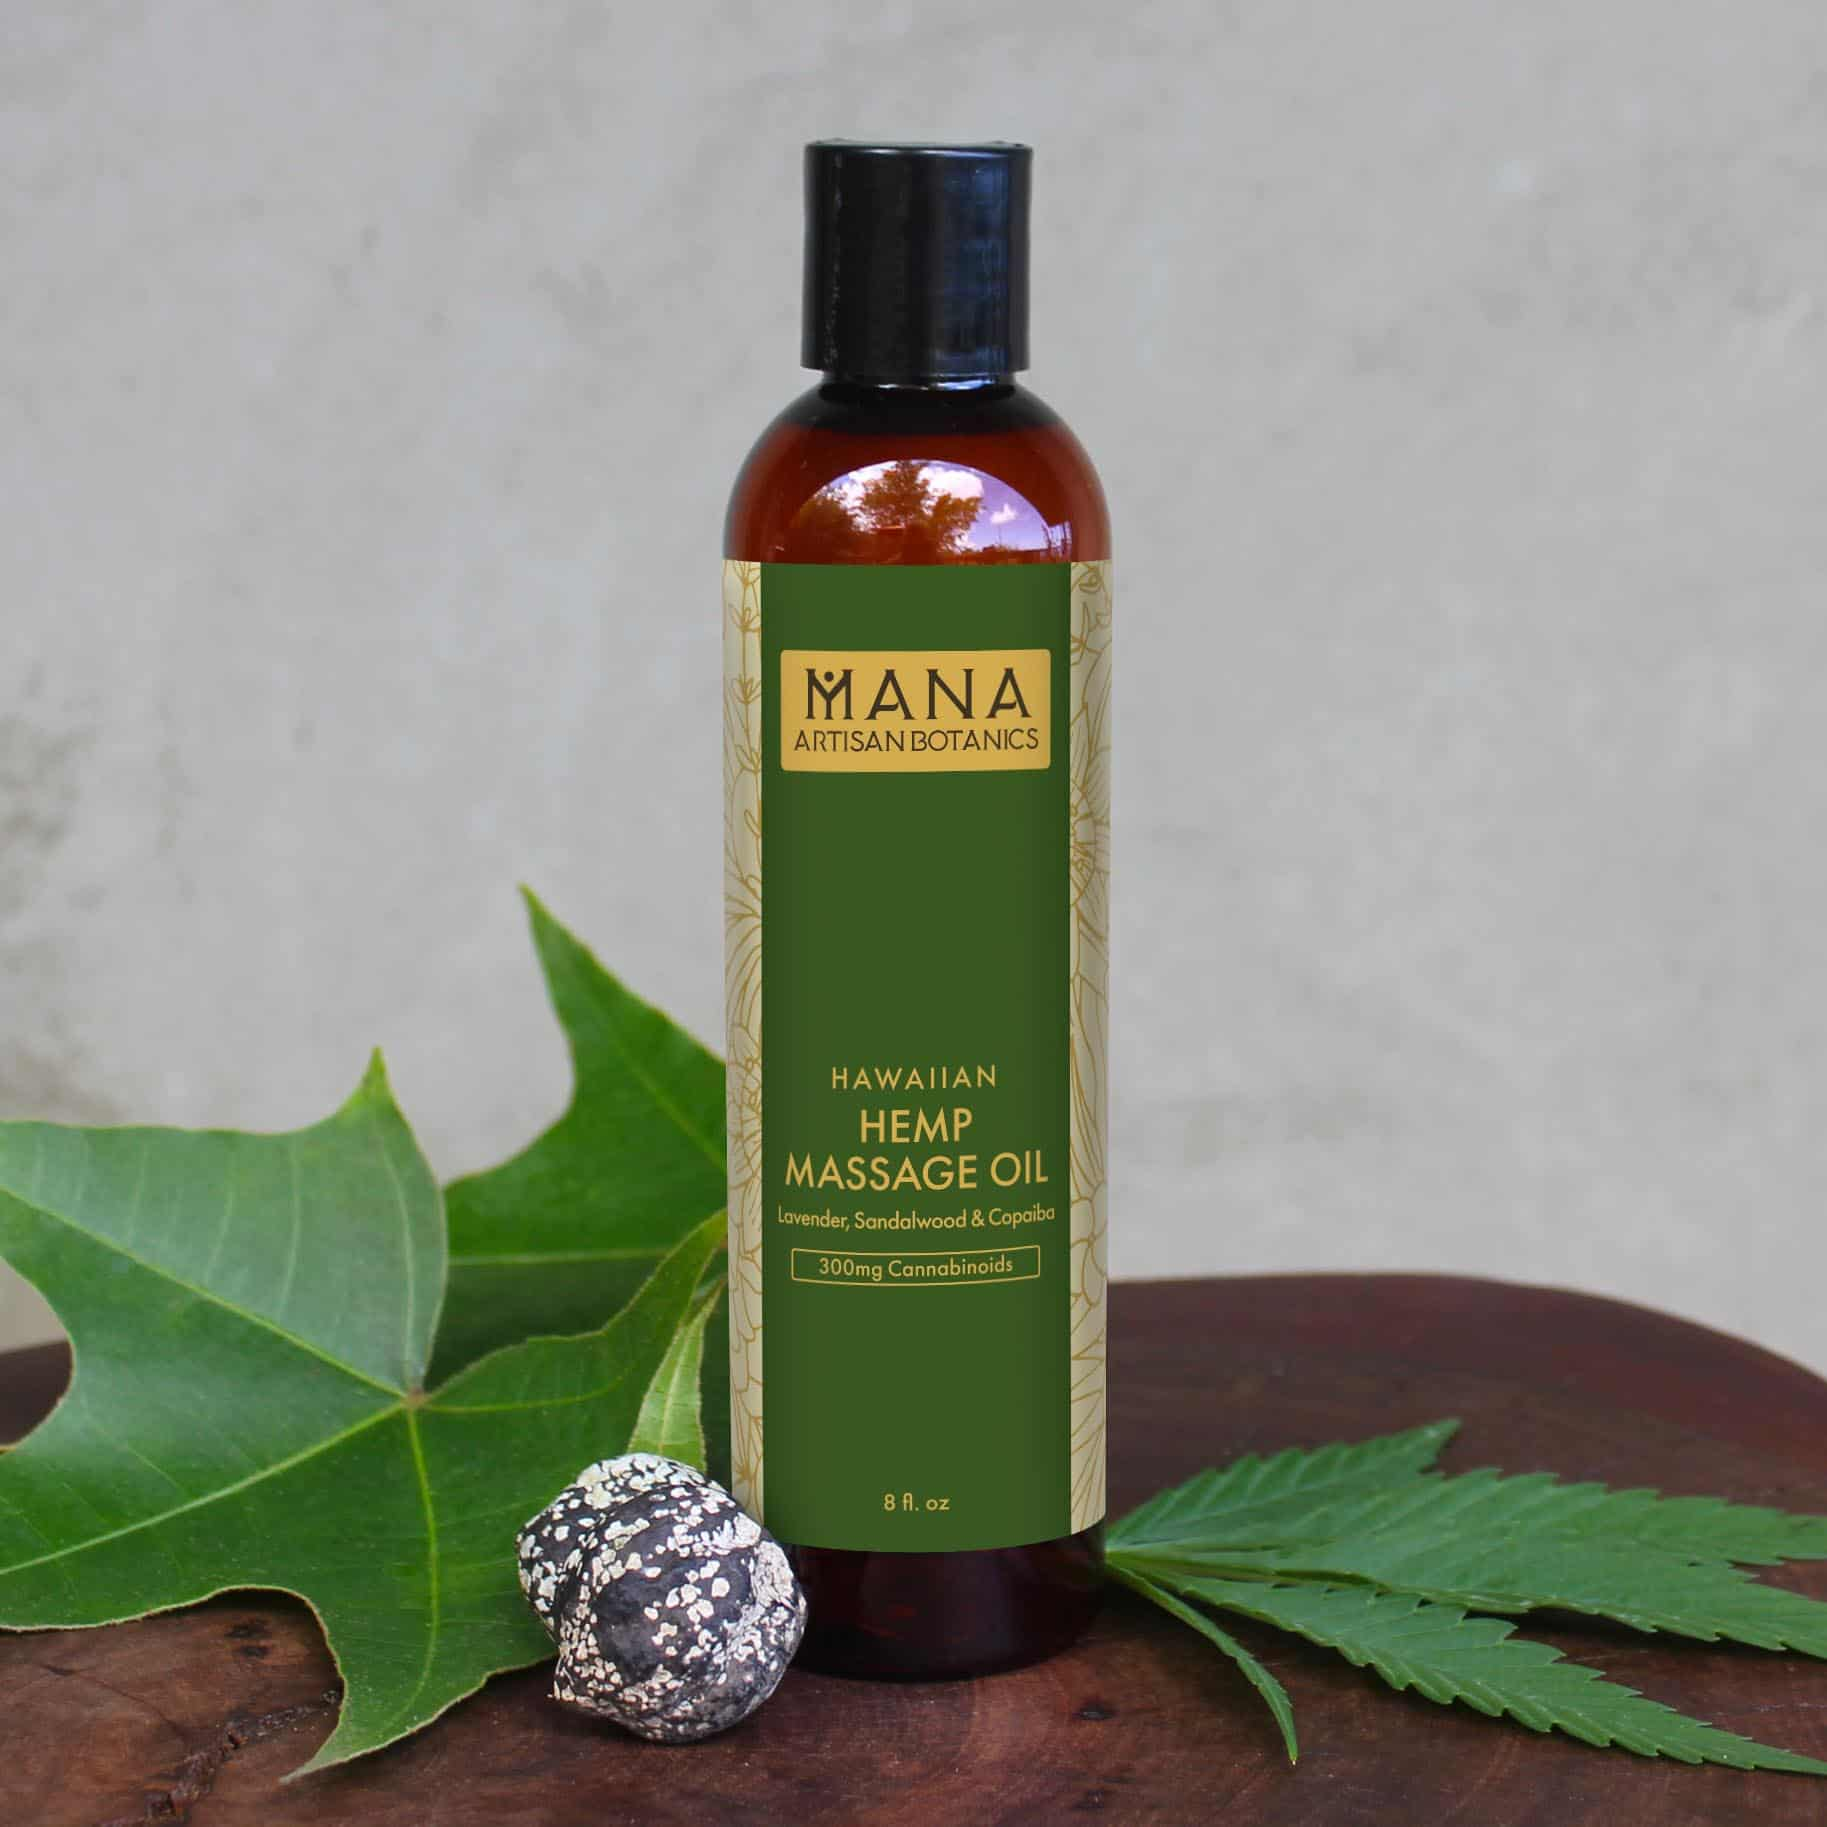 Mana Artisan Botanics Lavender, Sandalwood & Copaiba CBD Massage Oil